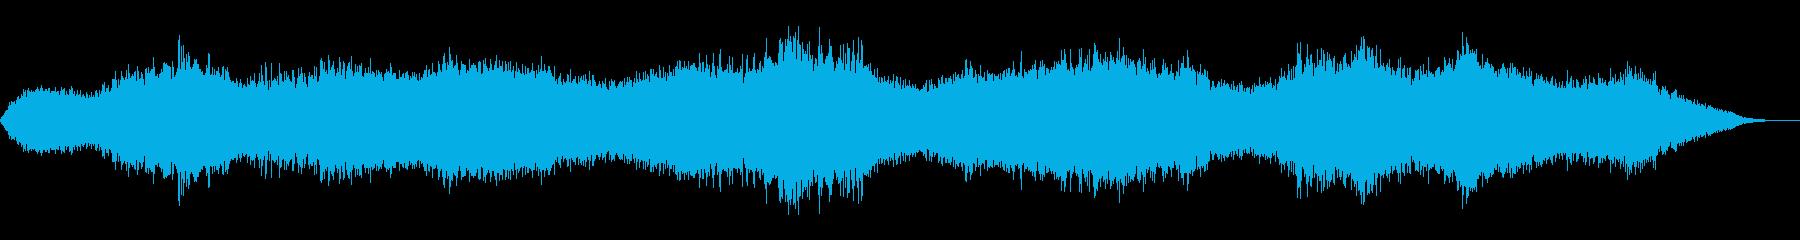 drone8の再生済みの波形